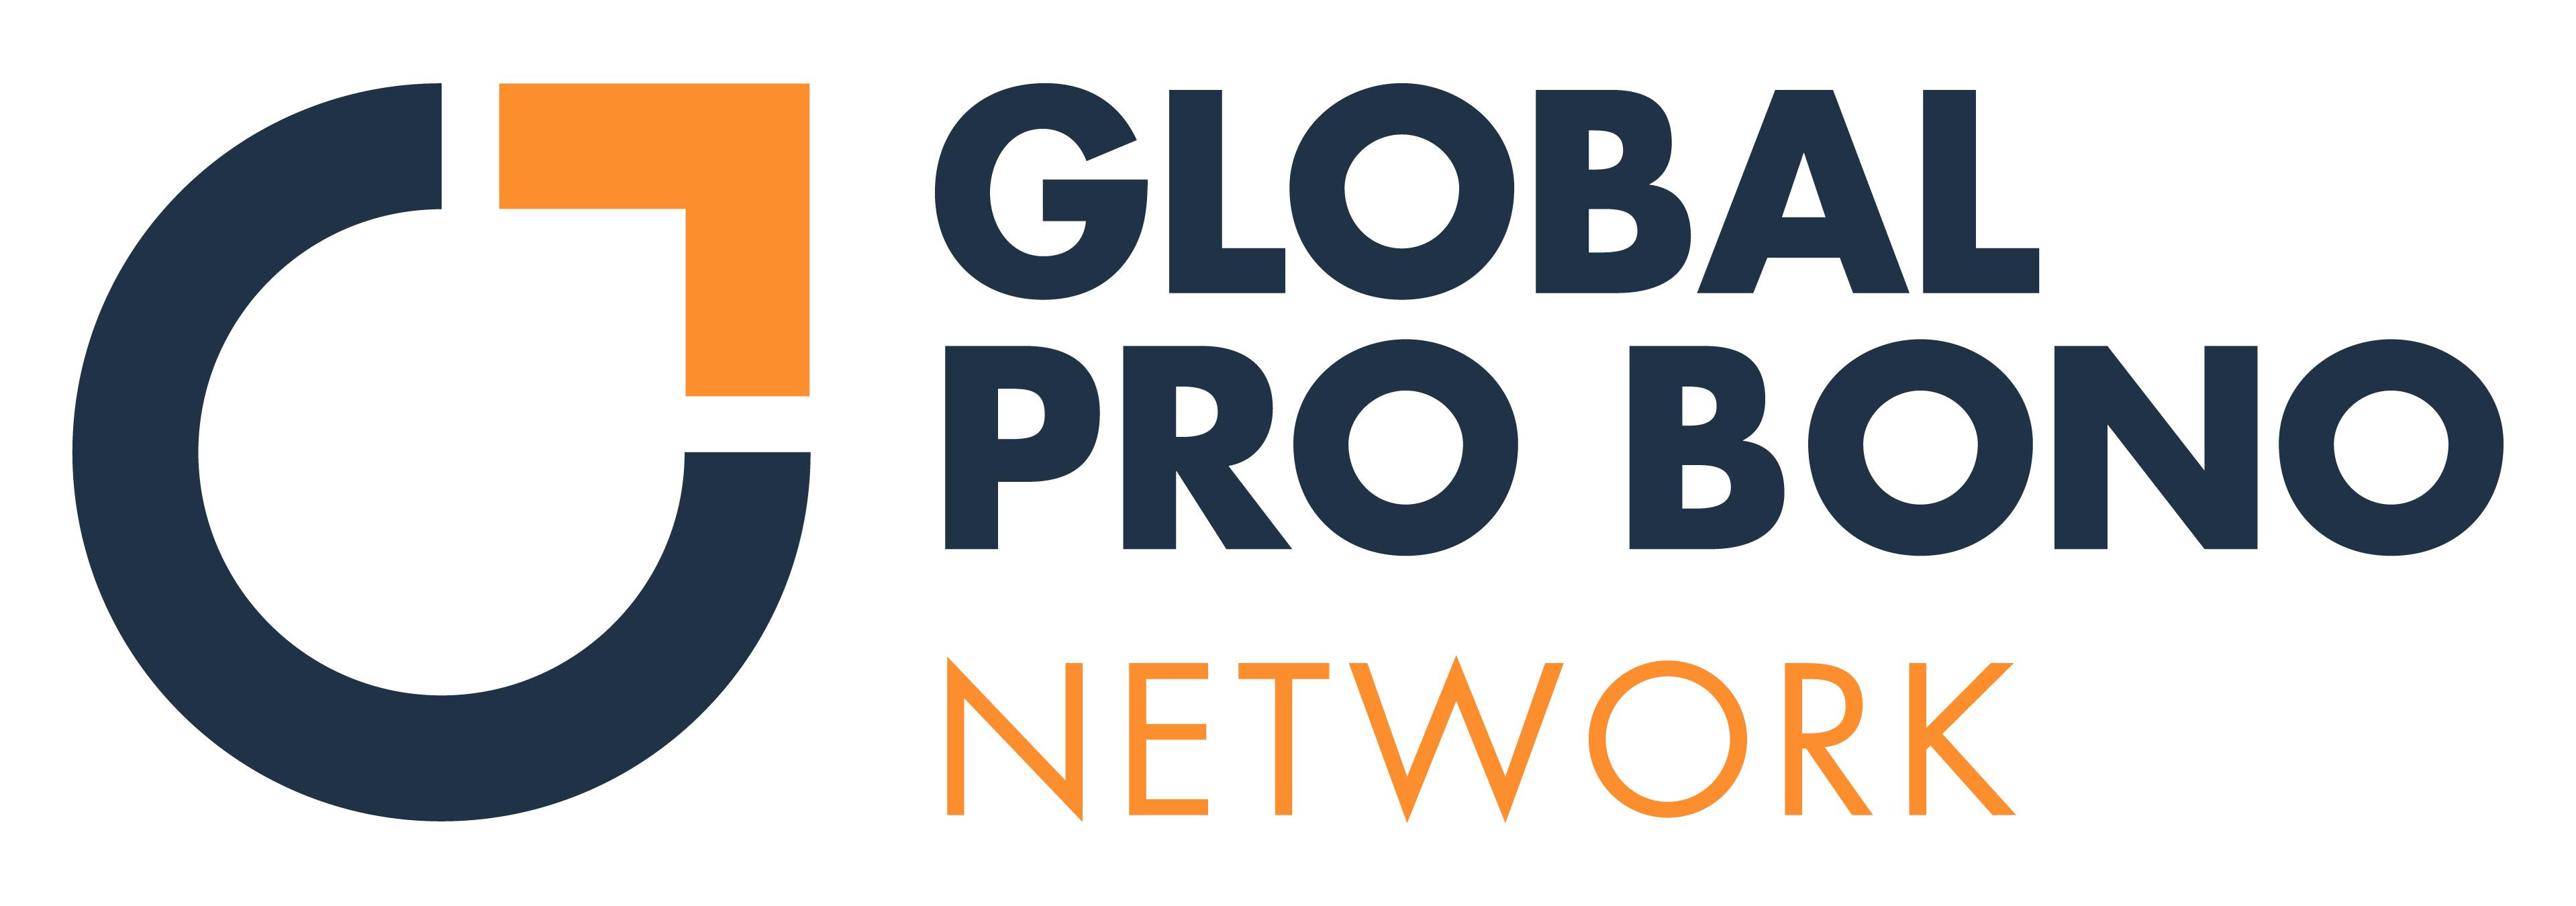 GPB-logo-color (2)